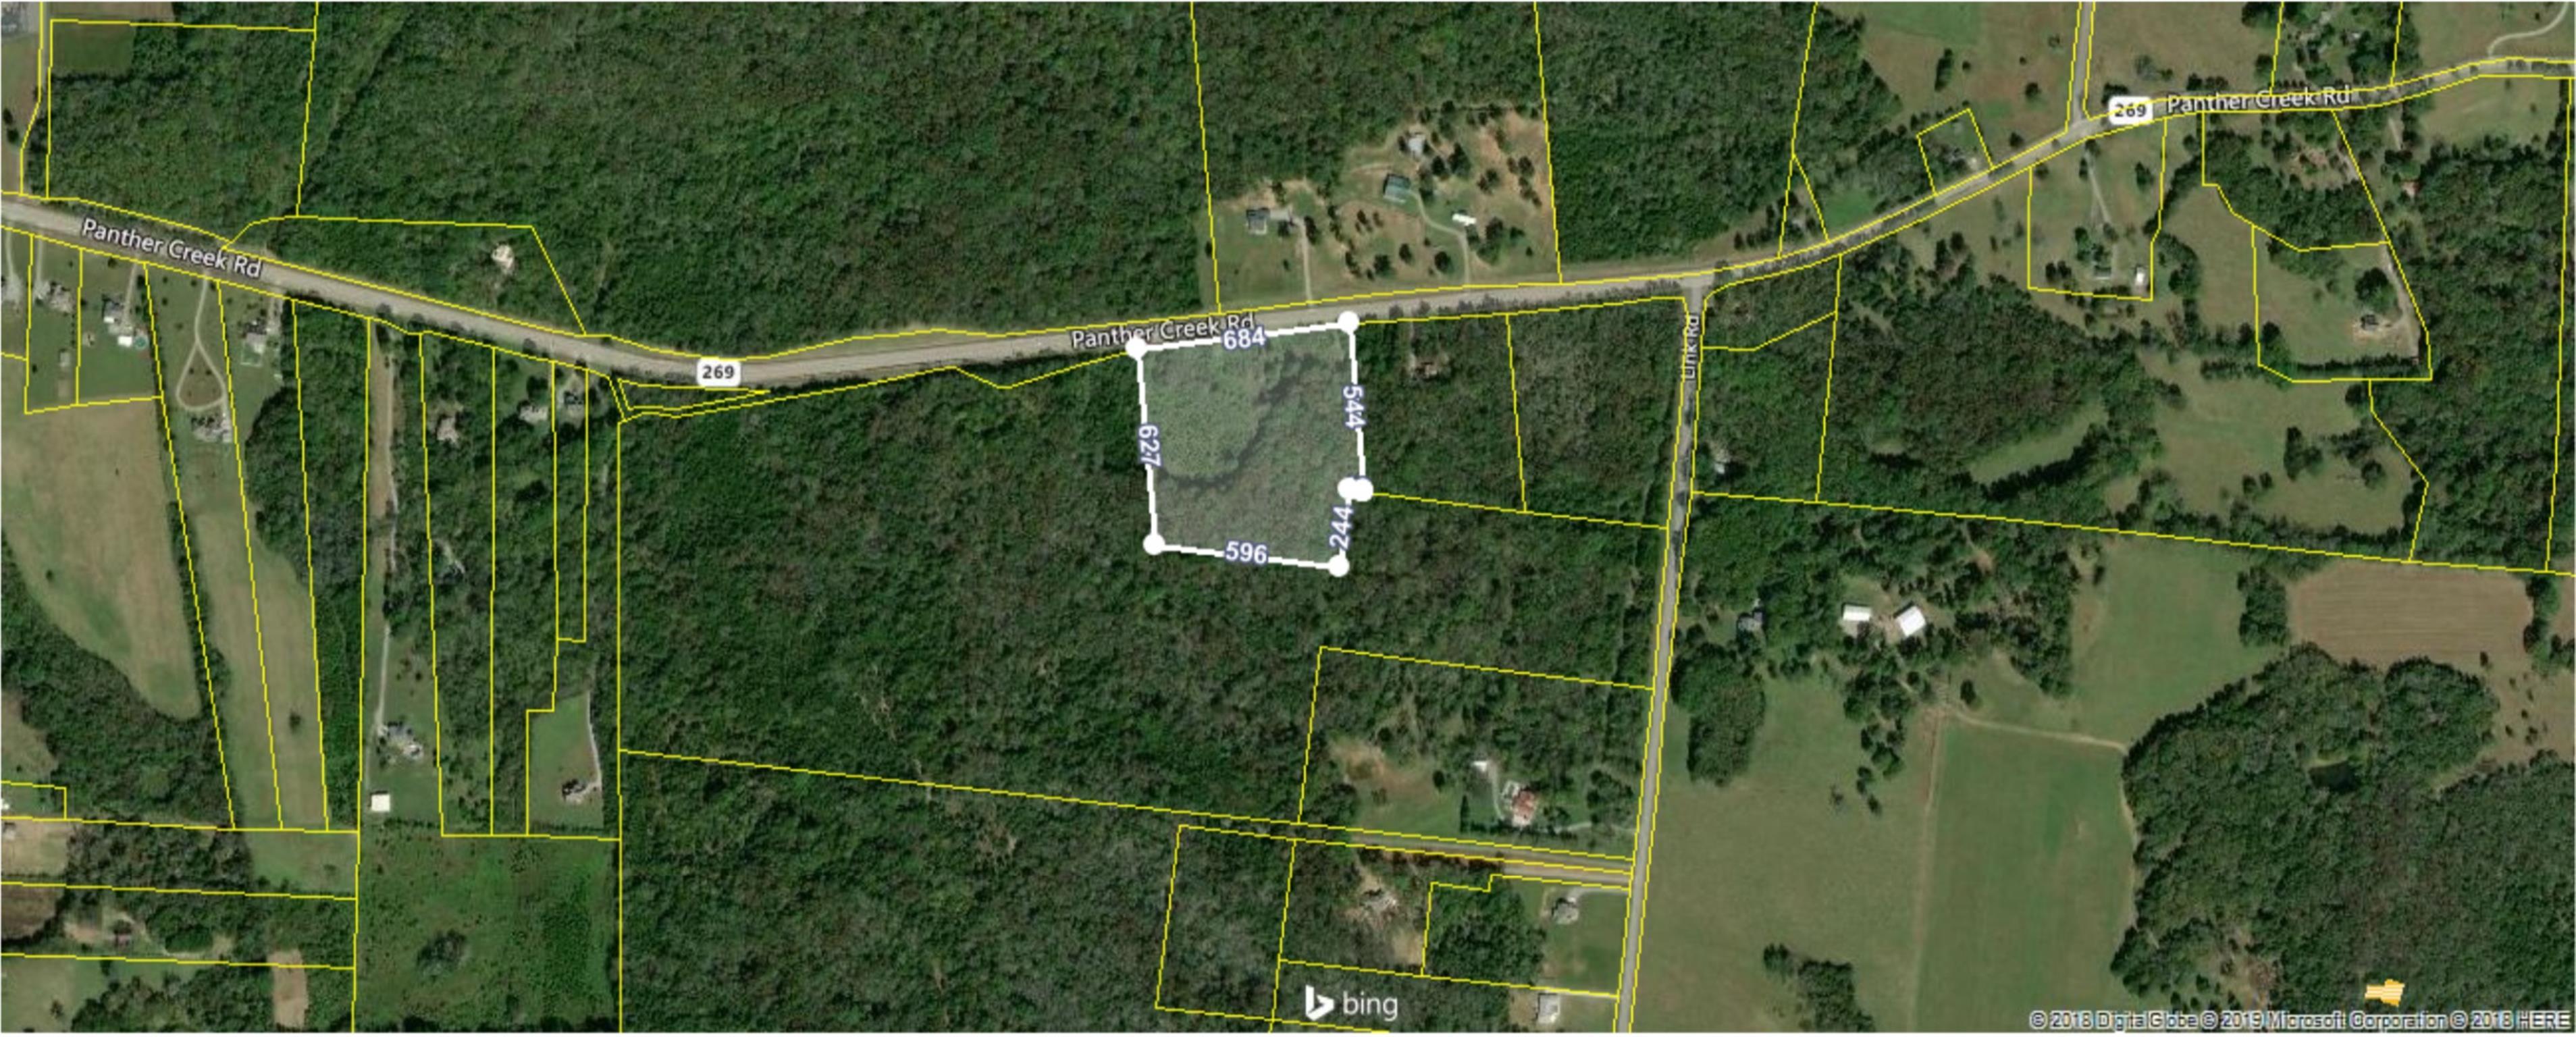 0 Panther Creek Rd, Christiana, TN 37037 - Christiana, TN real estate listing